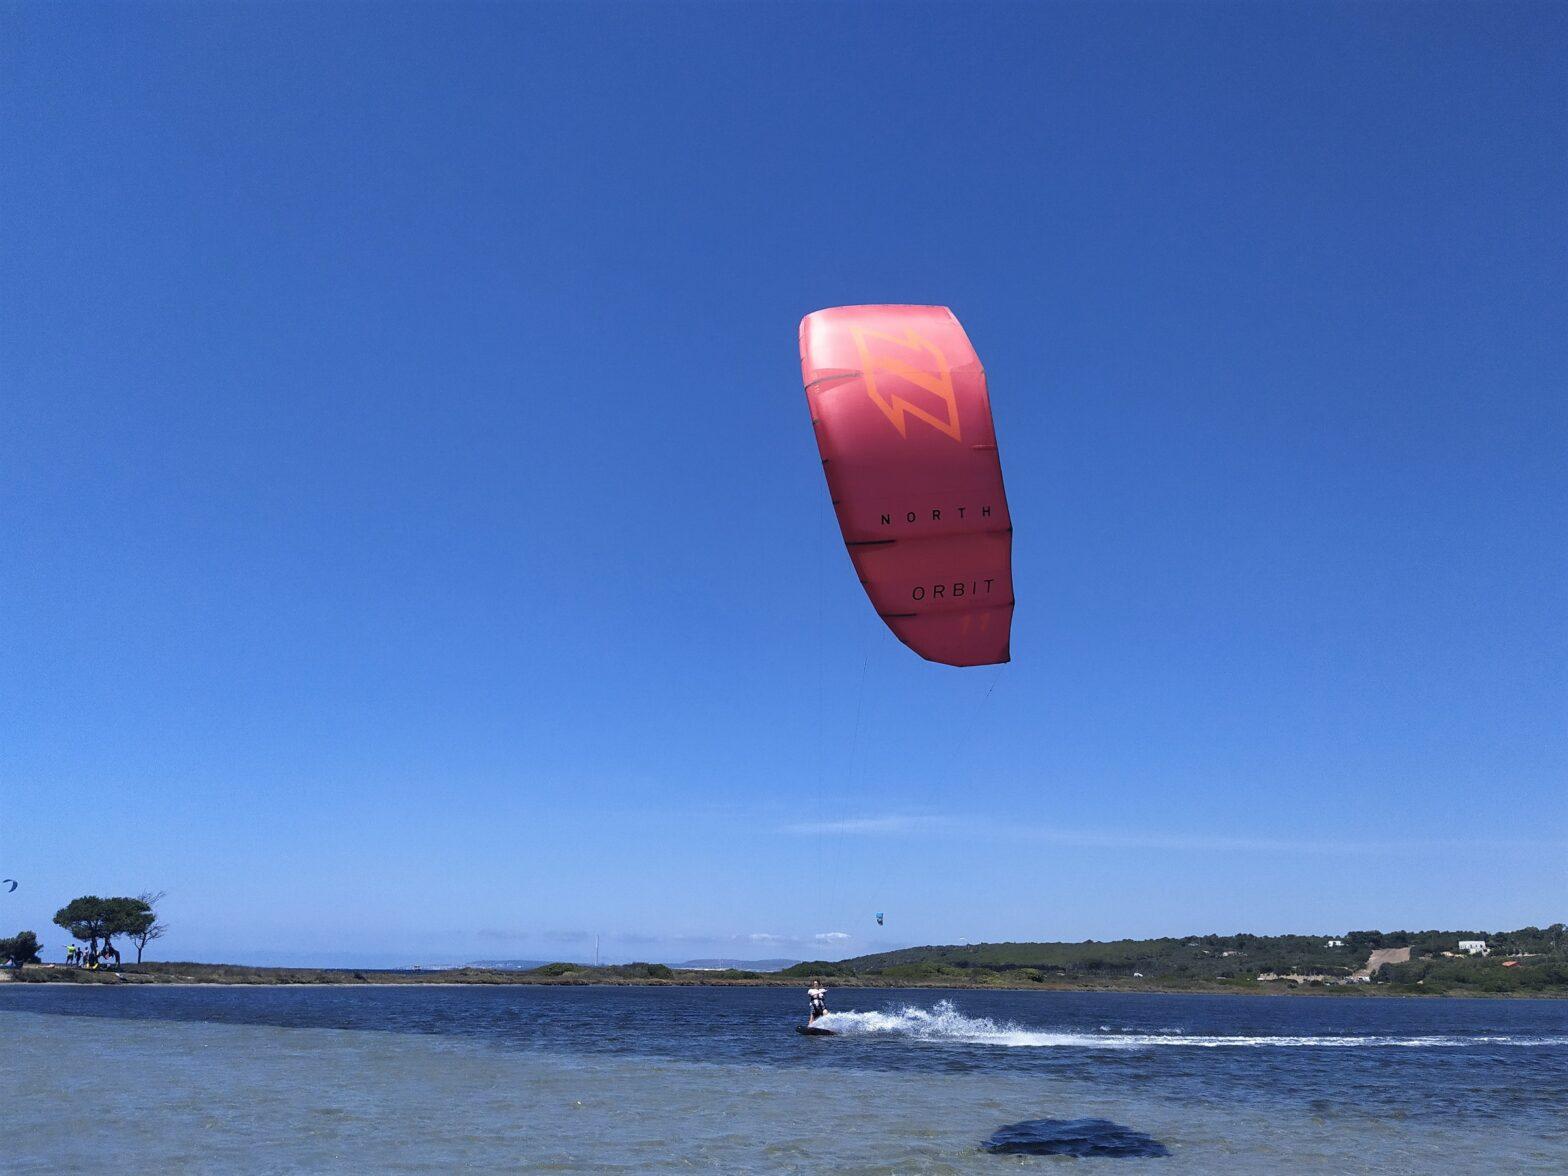 dove fare kitesurf in Sardegna nei migliori kite spot